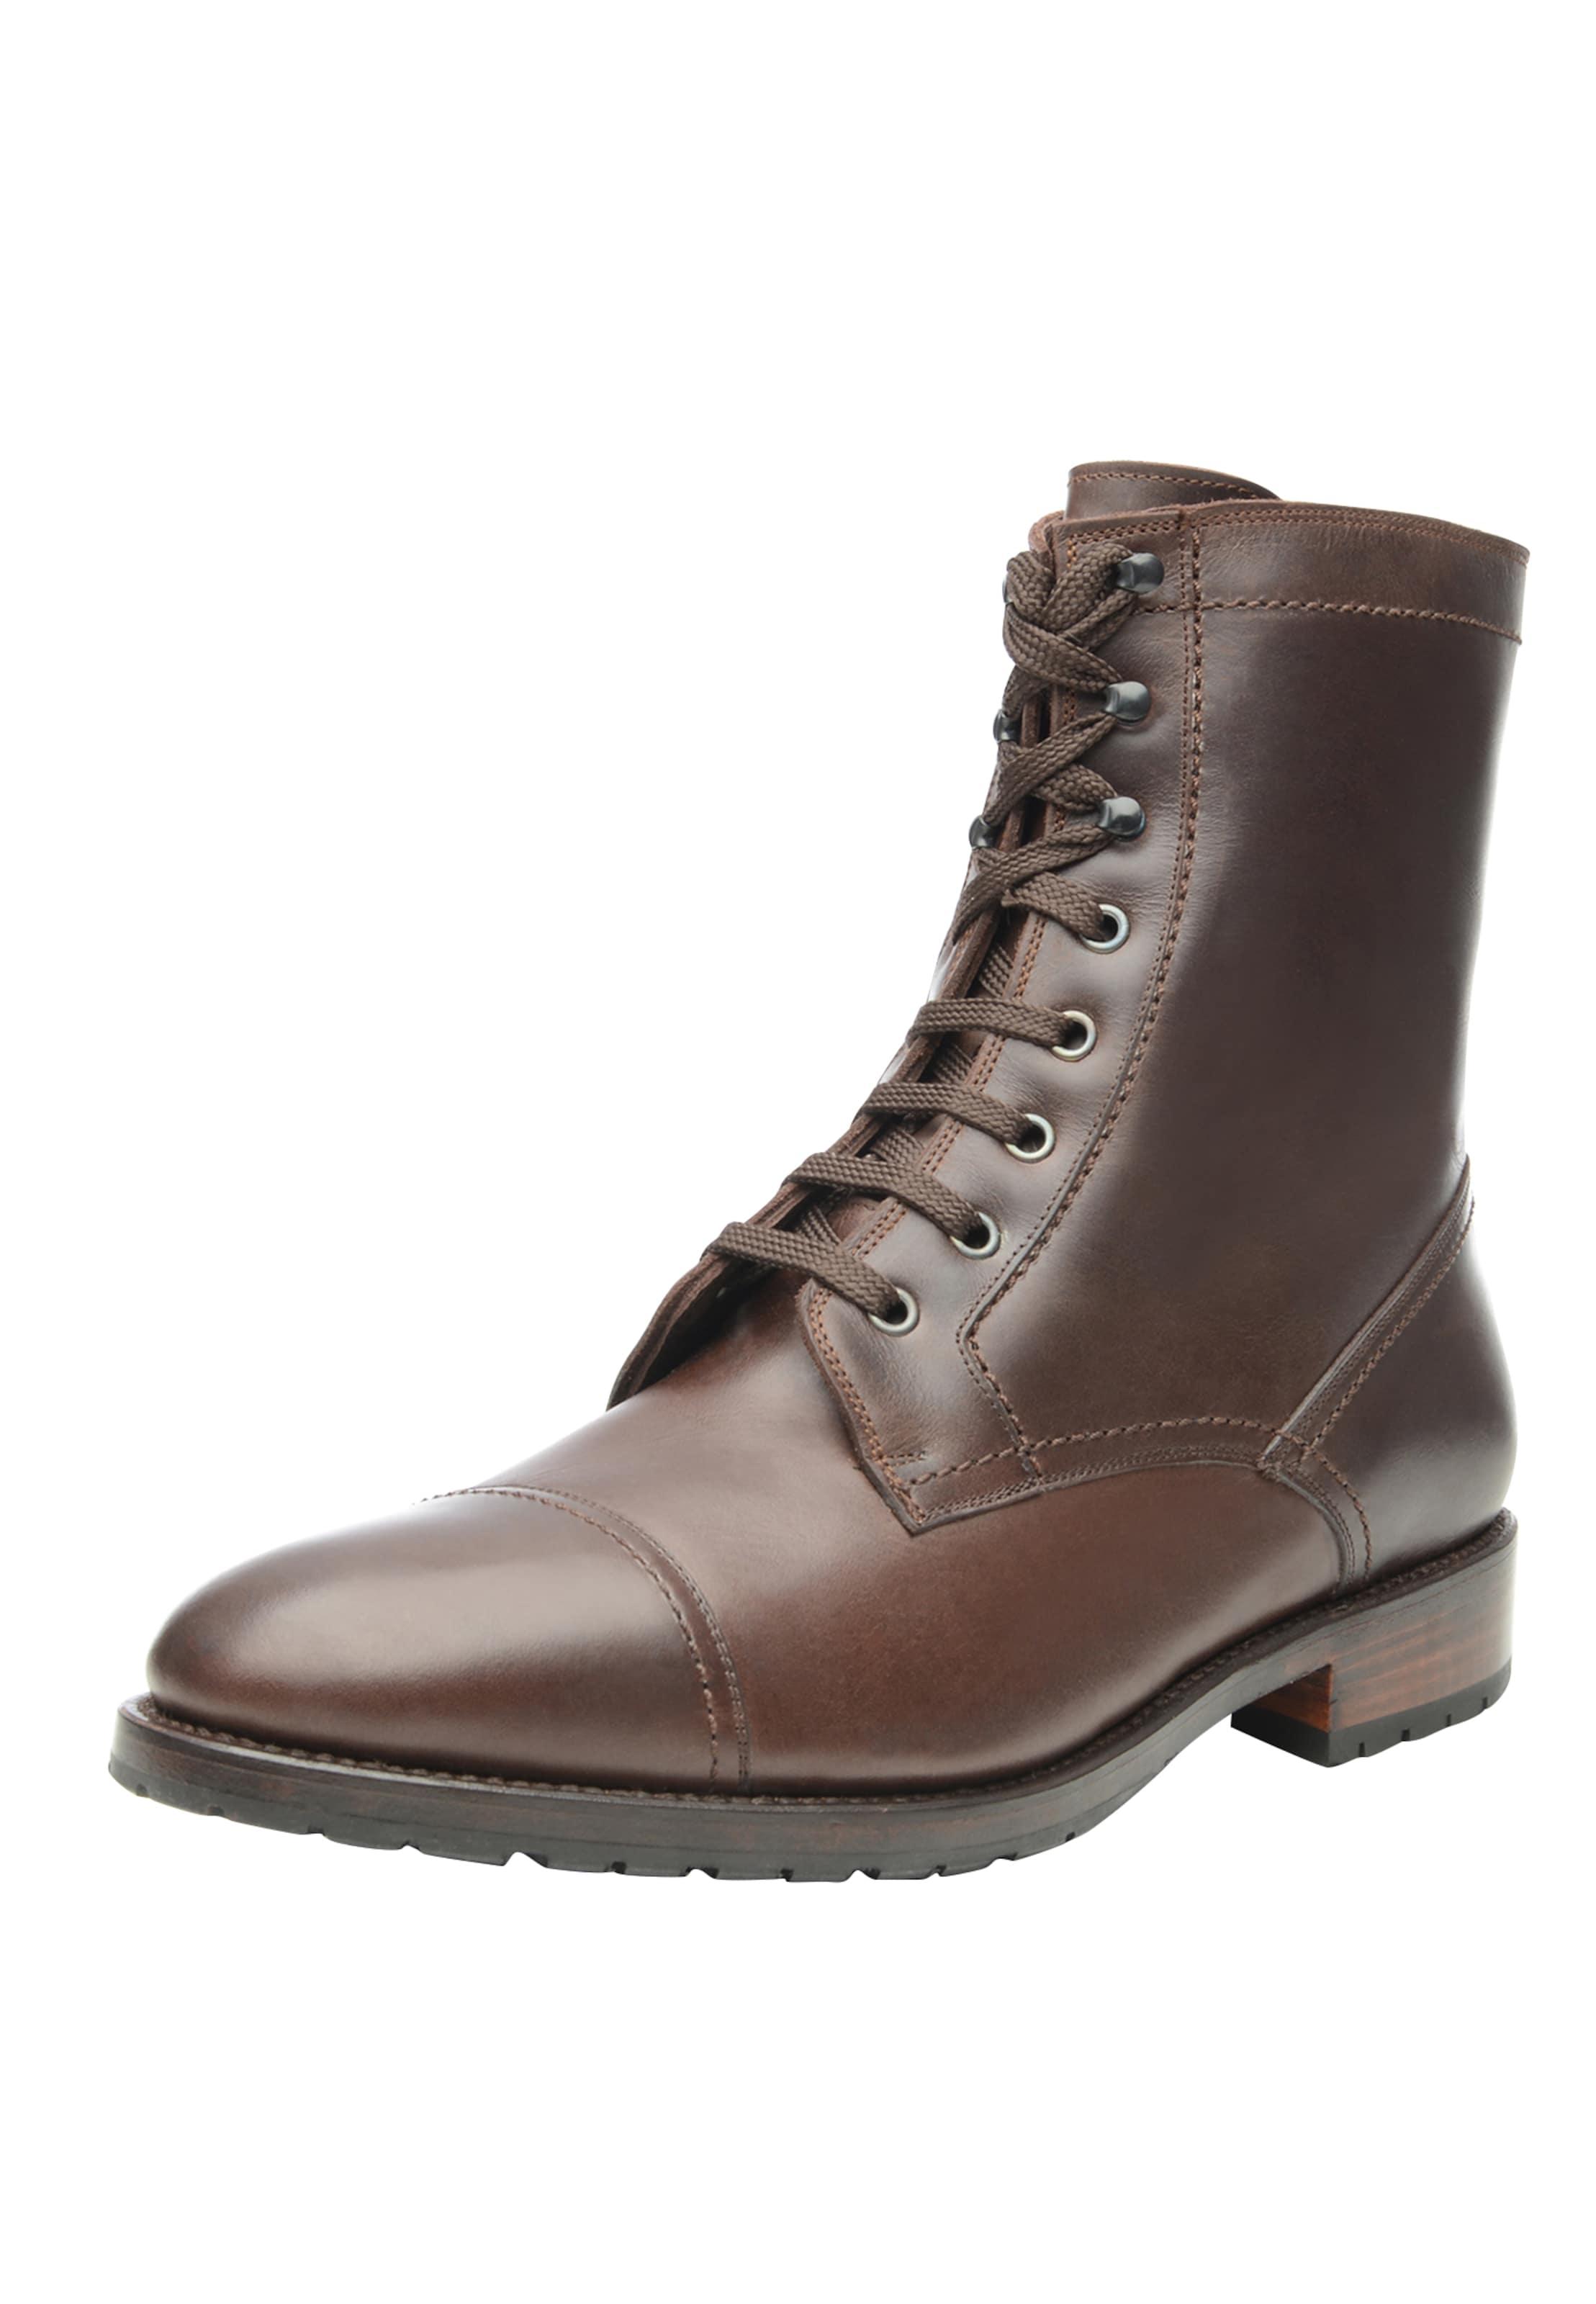 Haltbare Mode billige Schuhe SHOEPASSION | Winterboots 'No. 672' Schuhe Gut getragene Schuhe